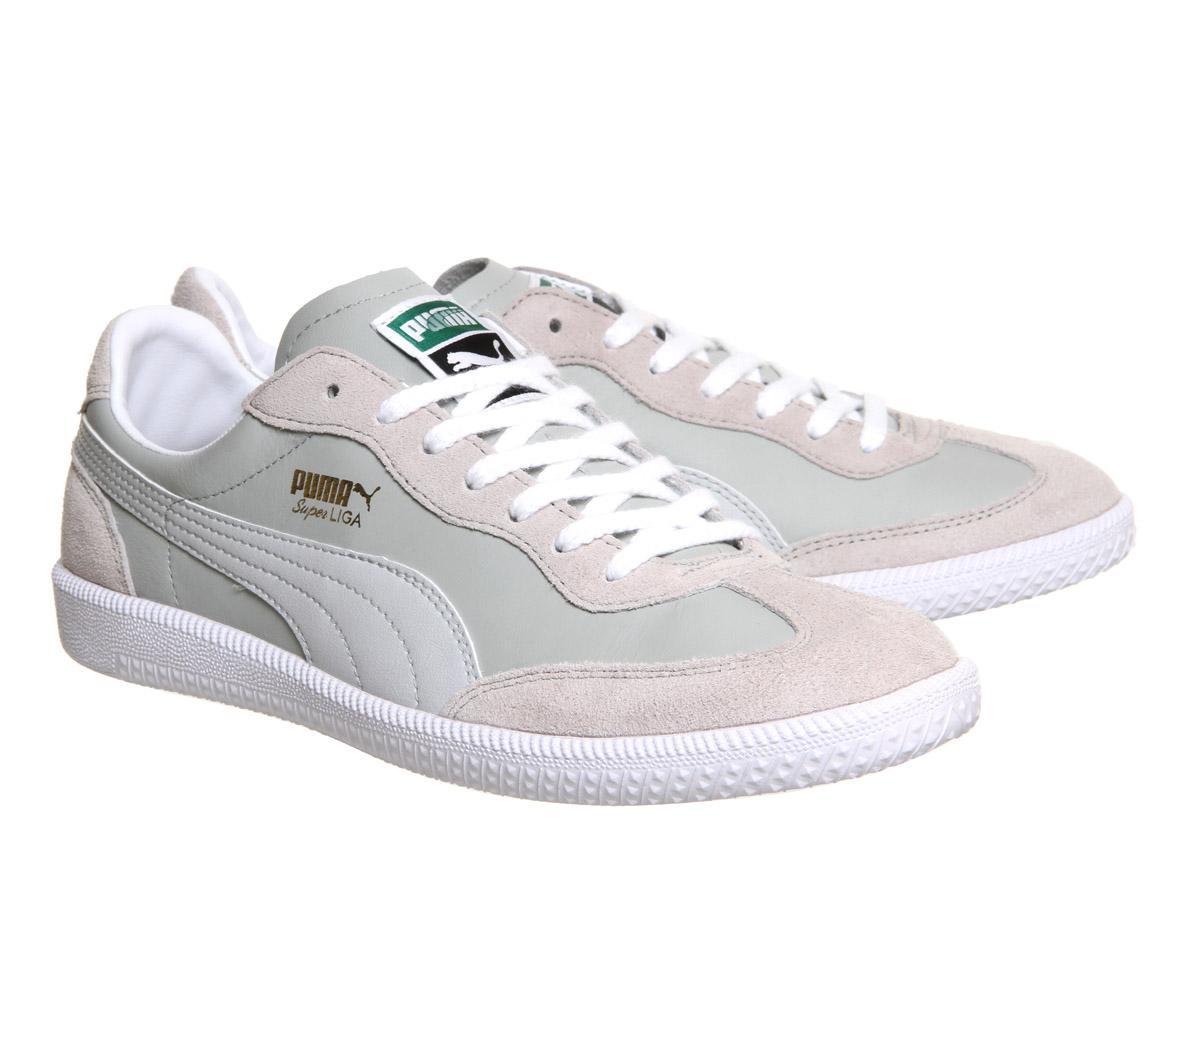 PUMA Sneaker Super Liga Retro Calzature Sneaker Sport Classic Unisex Nuovo